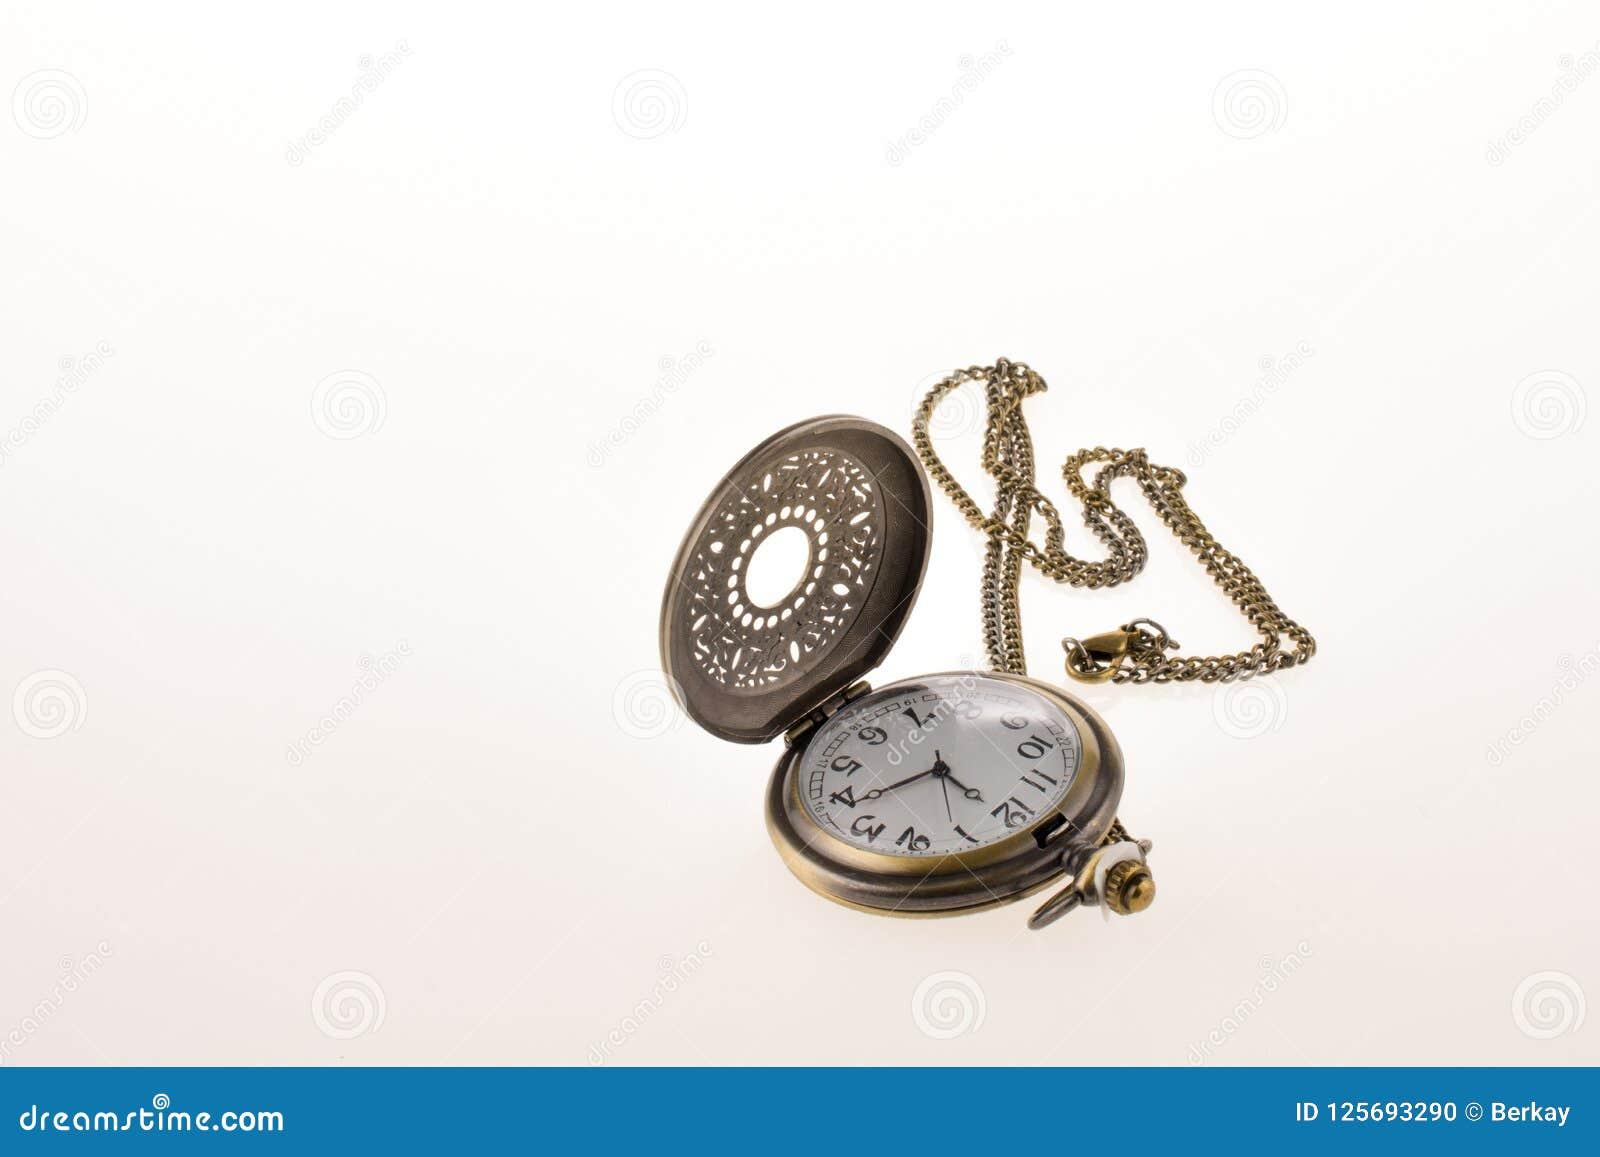 Isolated retro styled pocket watch